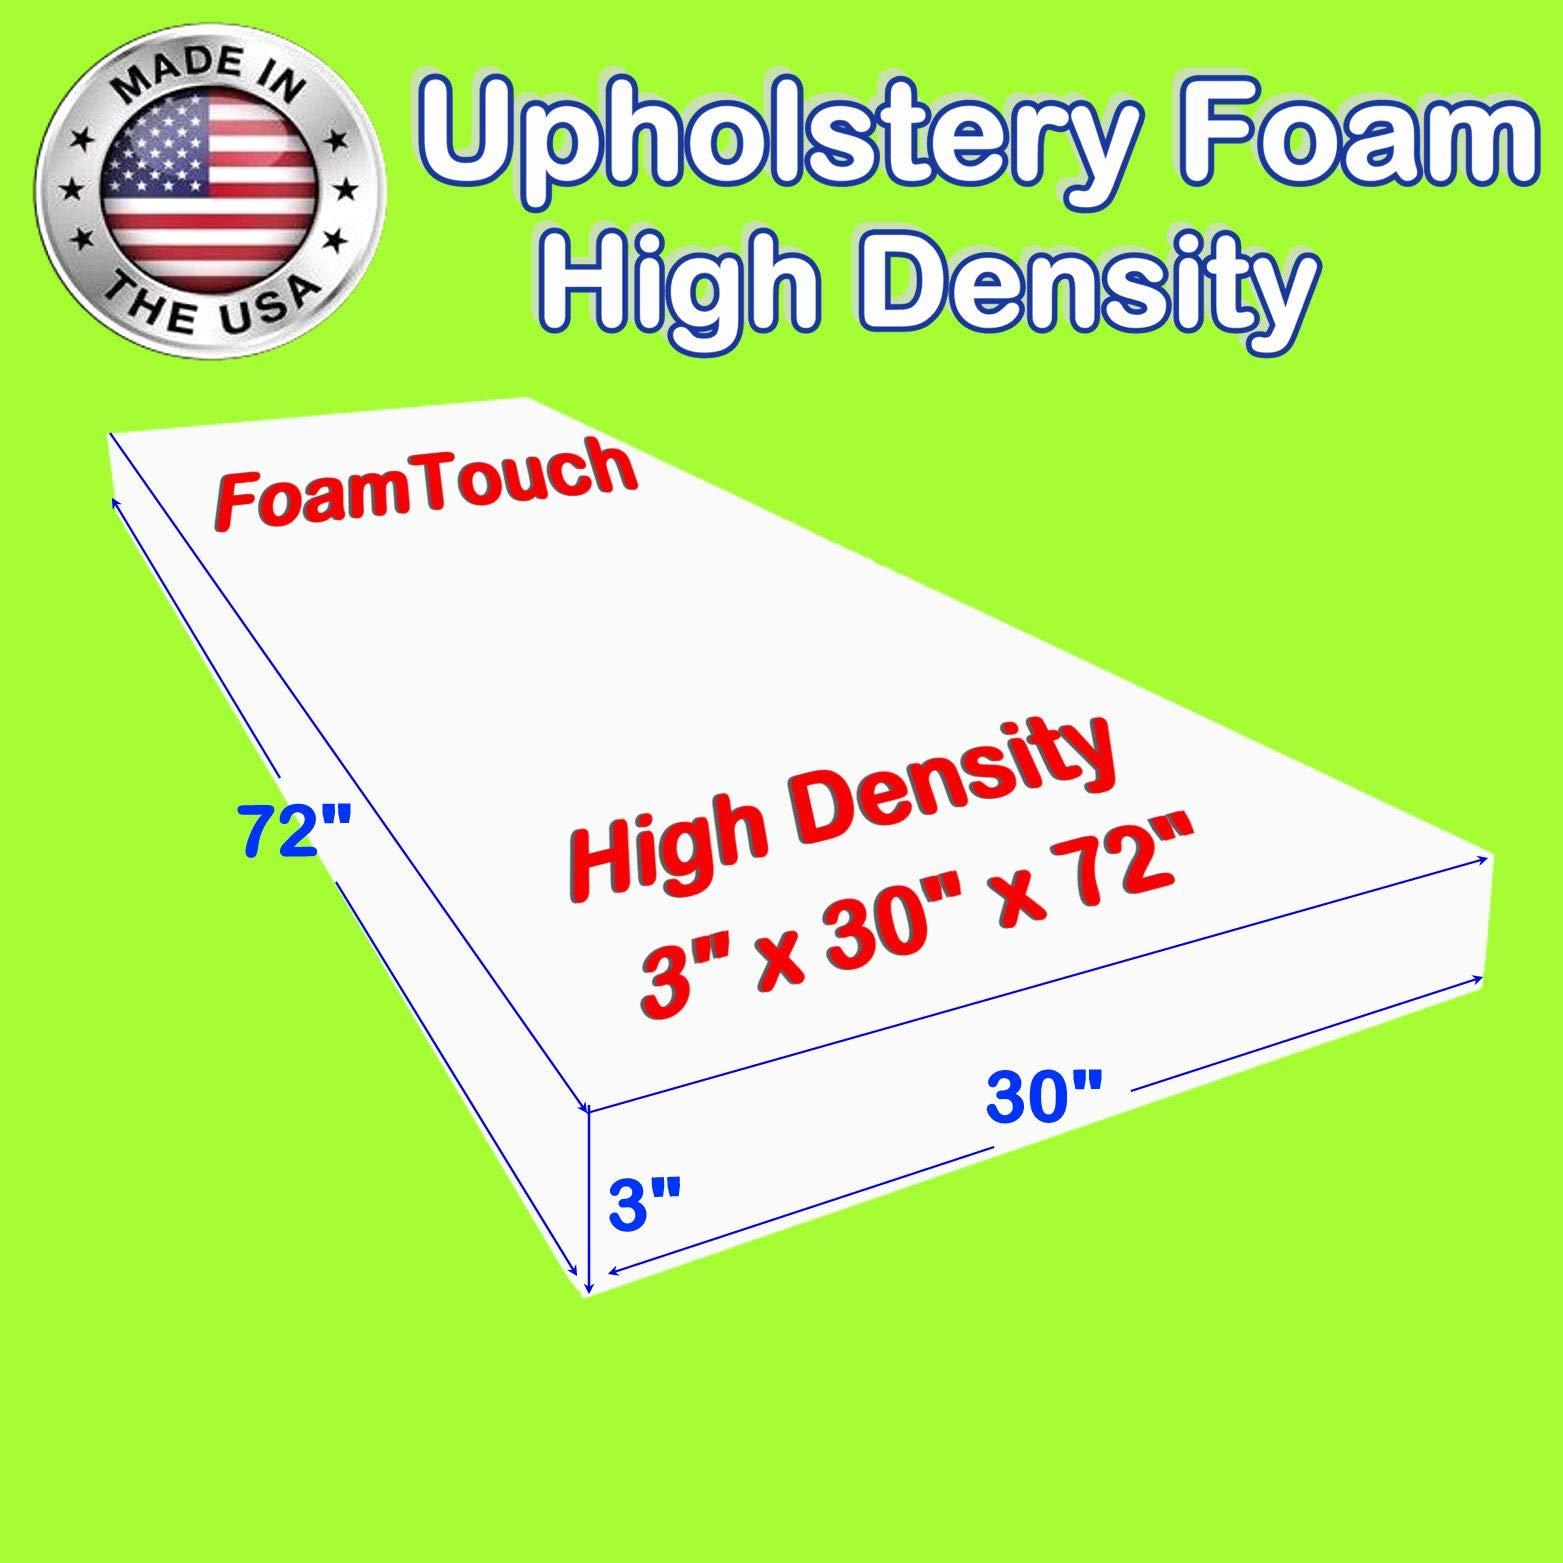 FoamTouch Upholstery Foam Cushion, 3'' L x 30'' W x 72'' H, High Density by FoamTouch